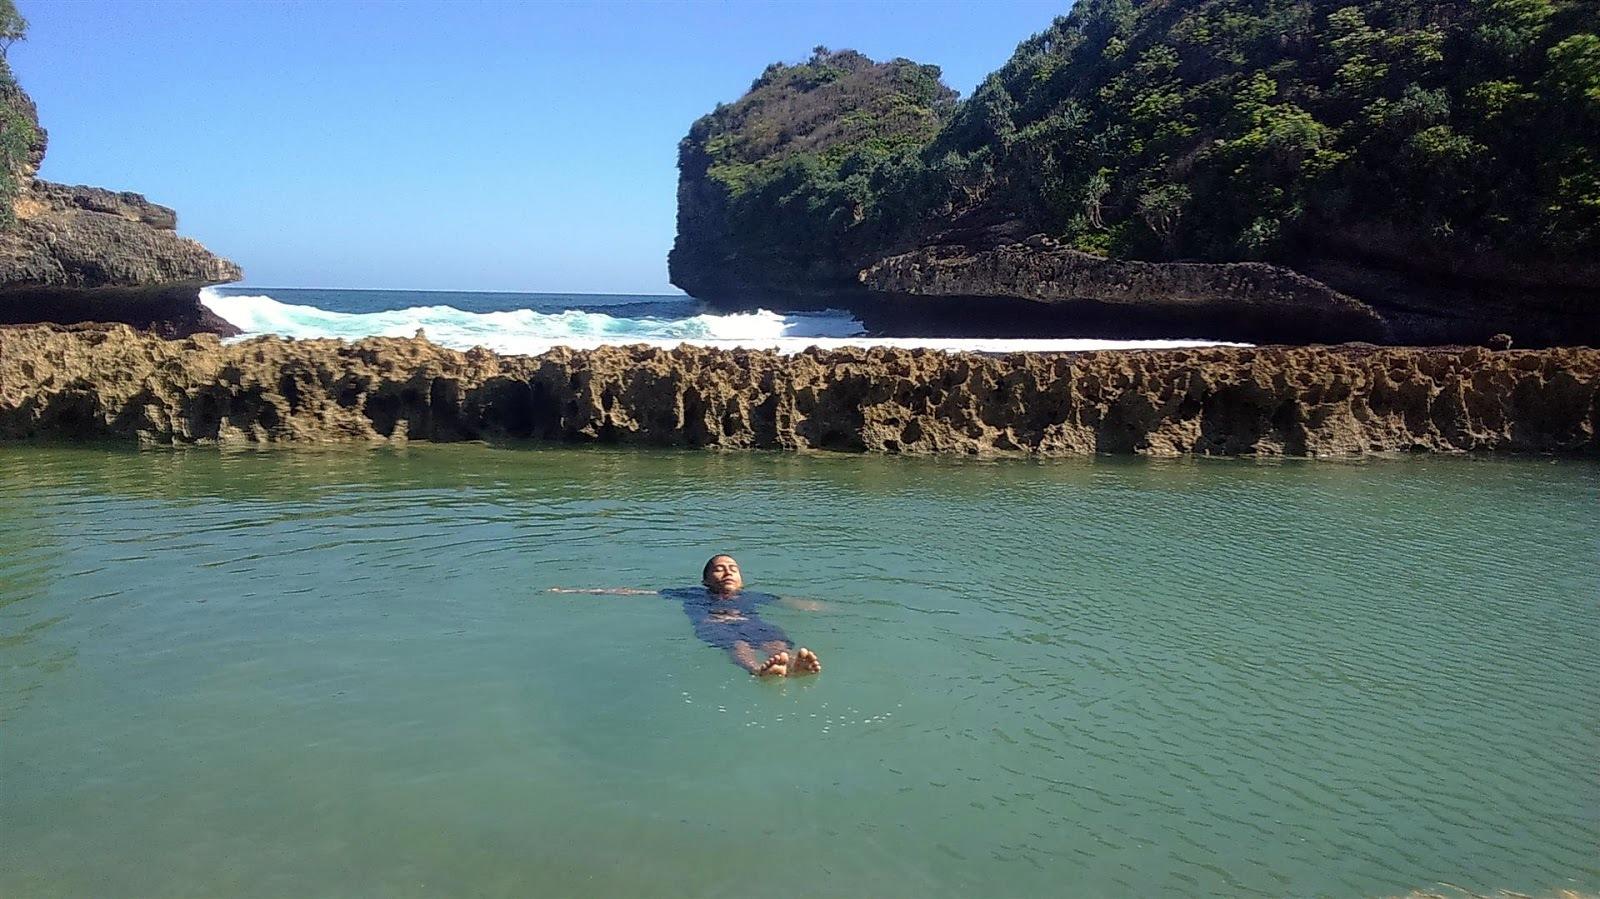 Pantai Batu Bengkung Kolam Renang Alaminya Langkah Kecilku Alami Bekung